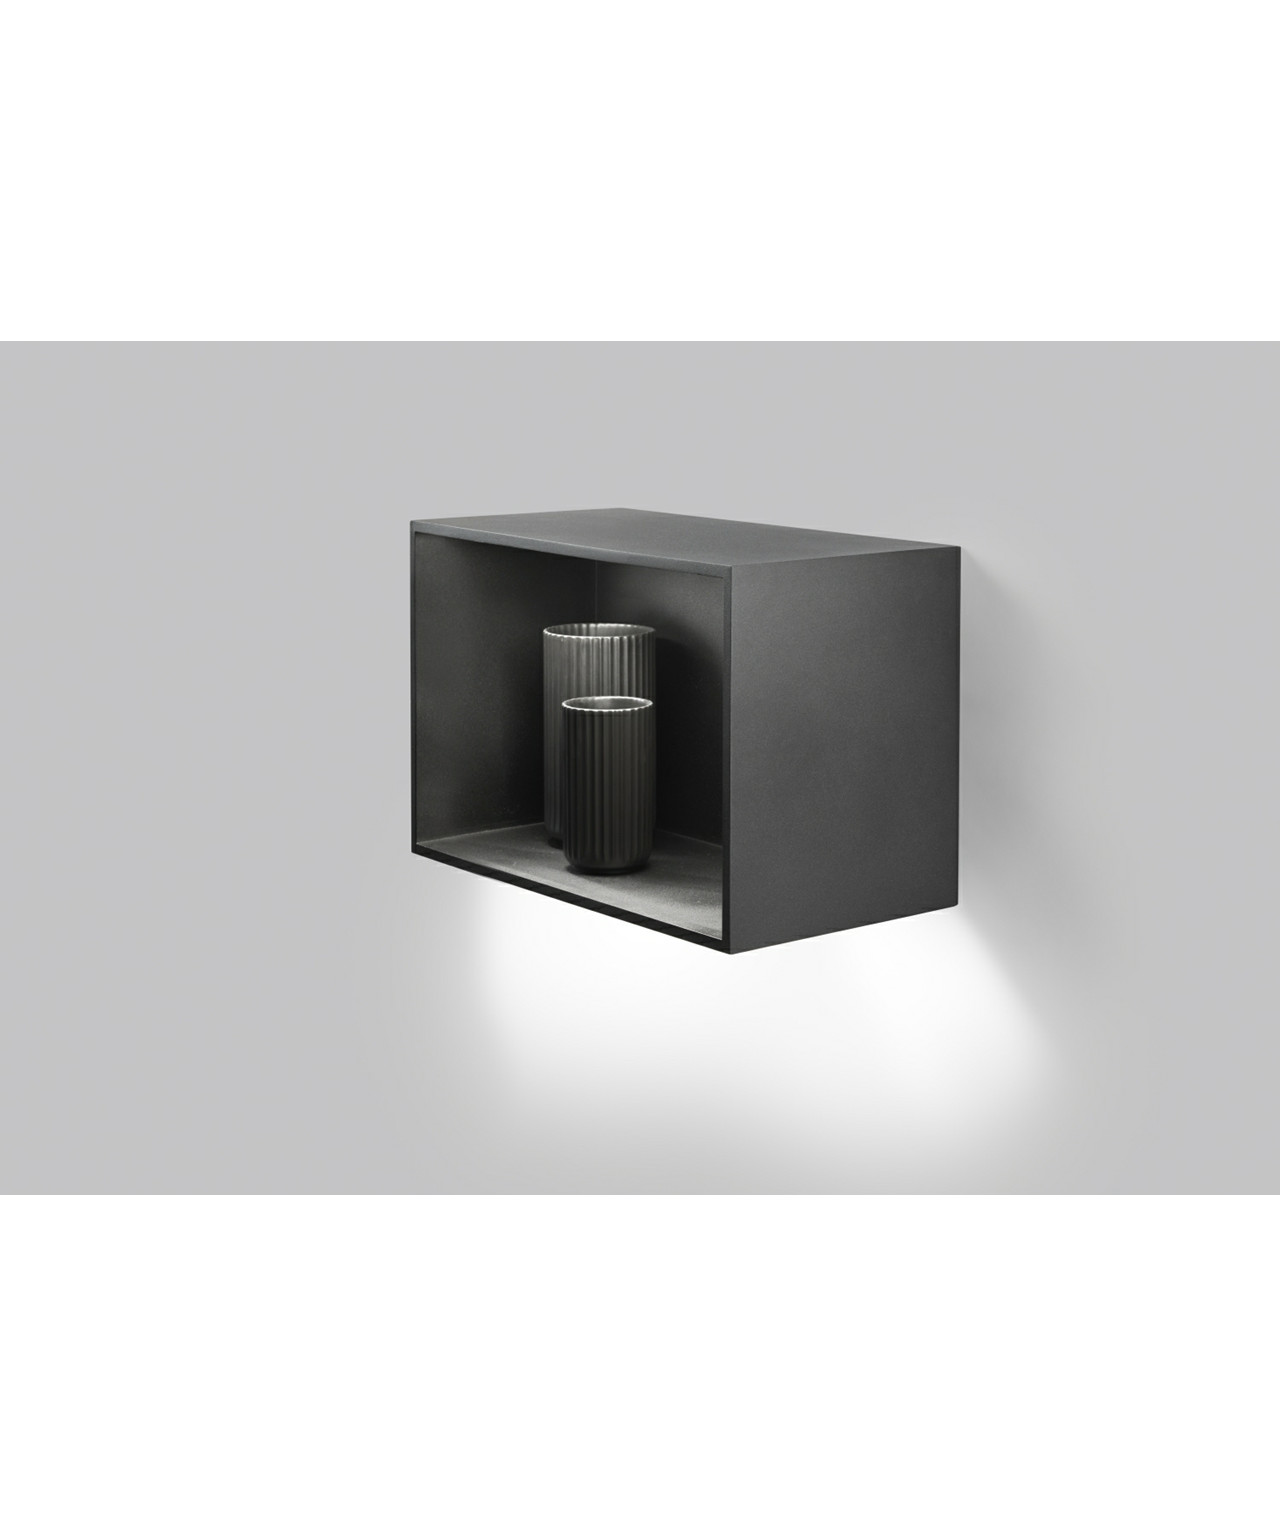 cab 1 wandleuchte schwarz light point. Black Bedroom Furniture Sets. Home Design Ideas